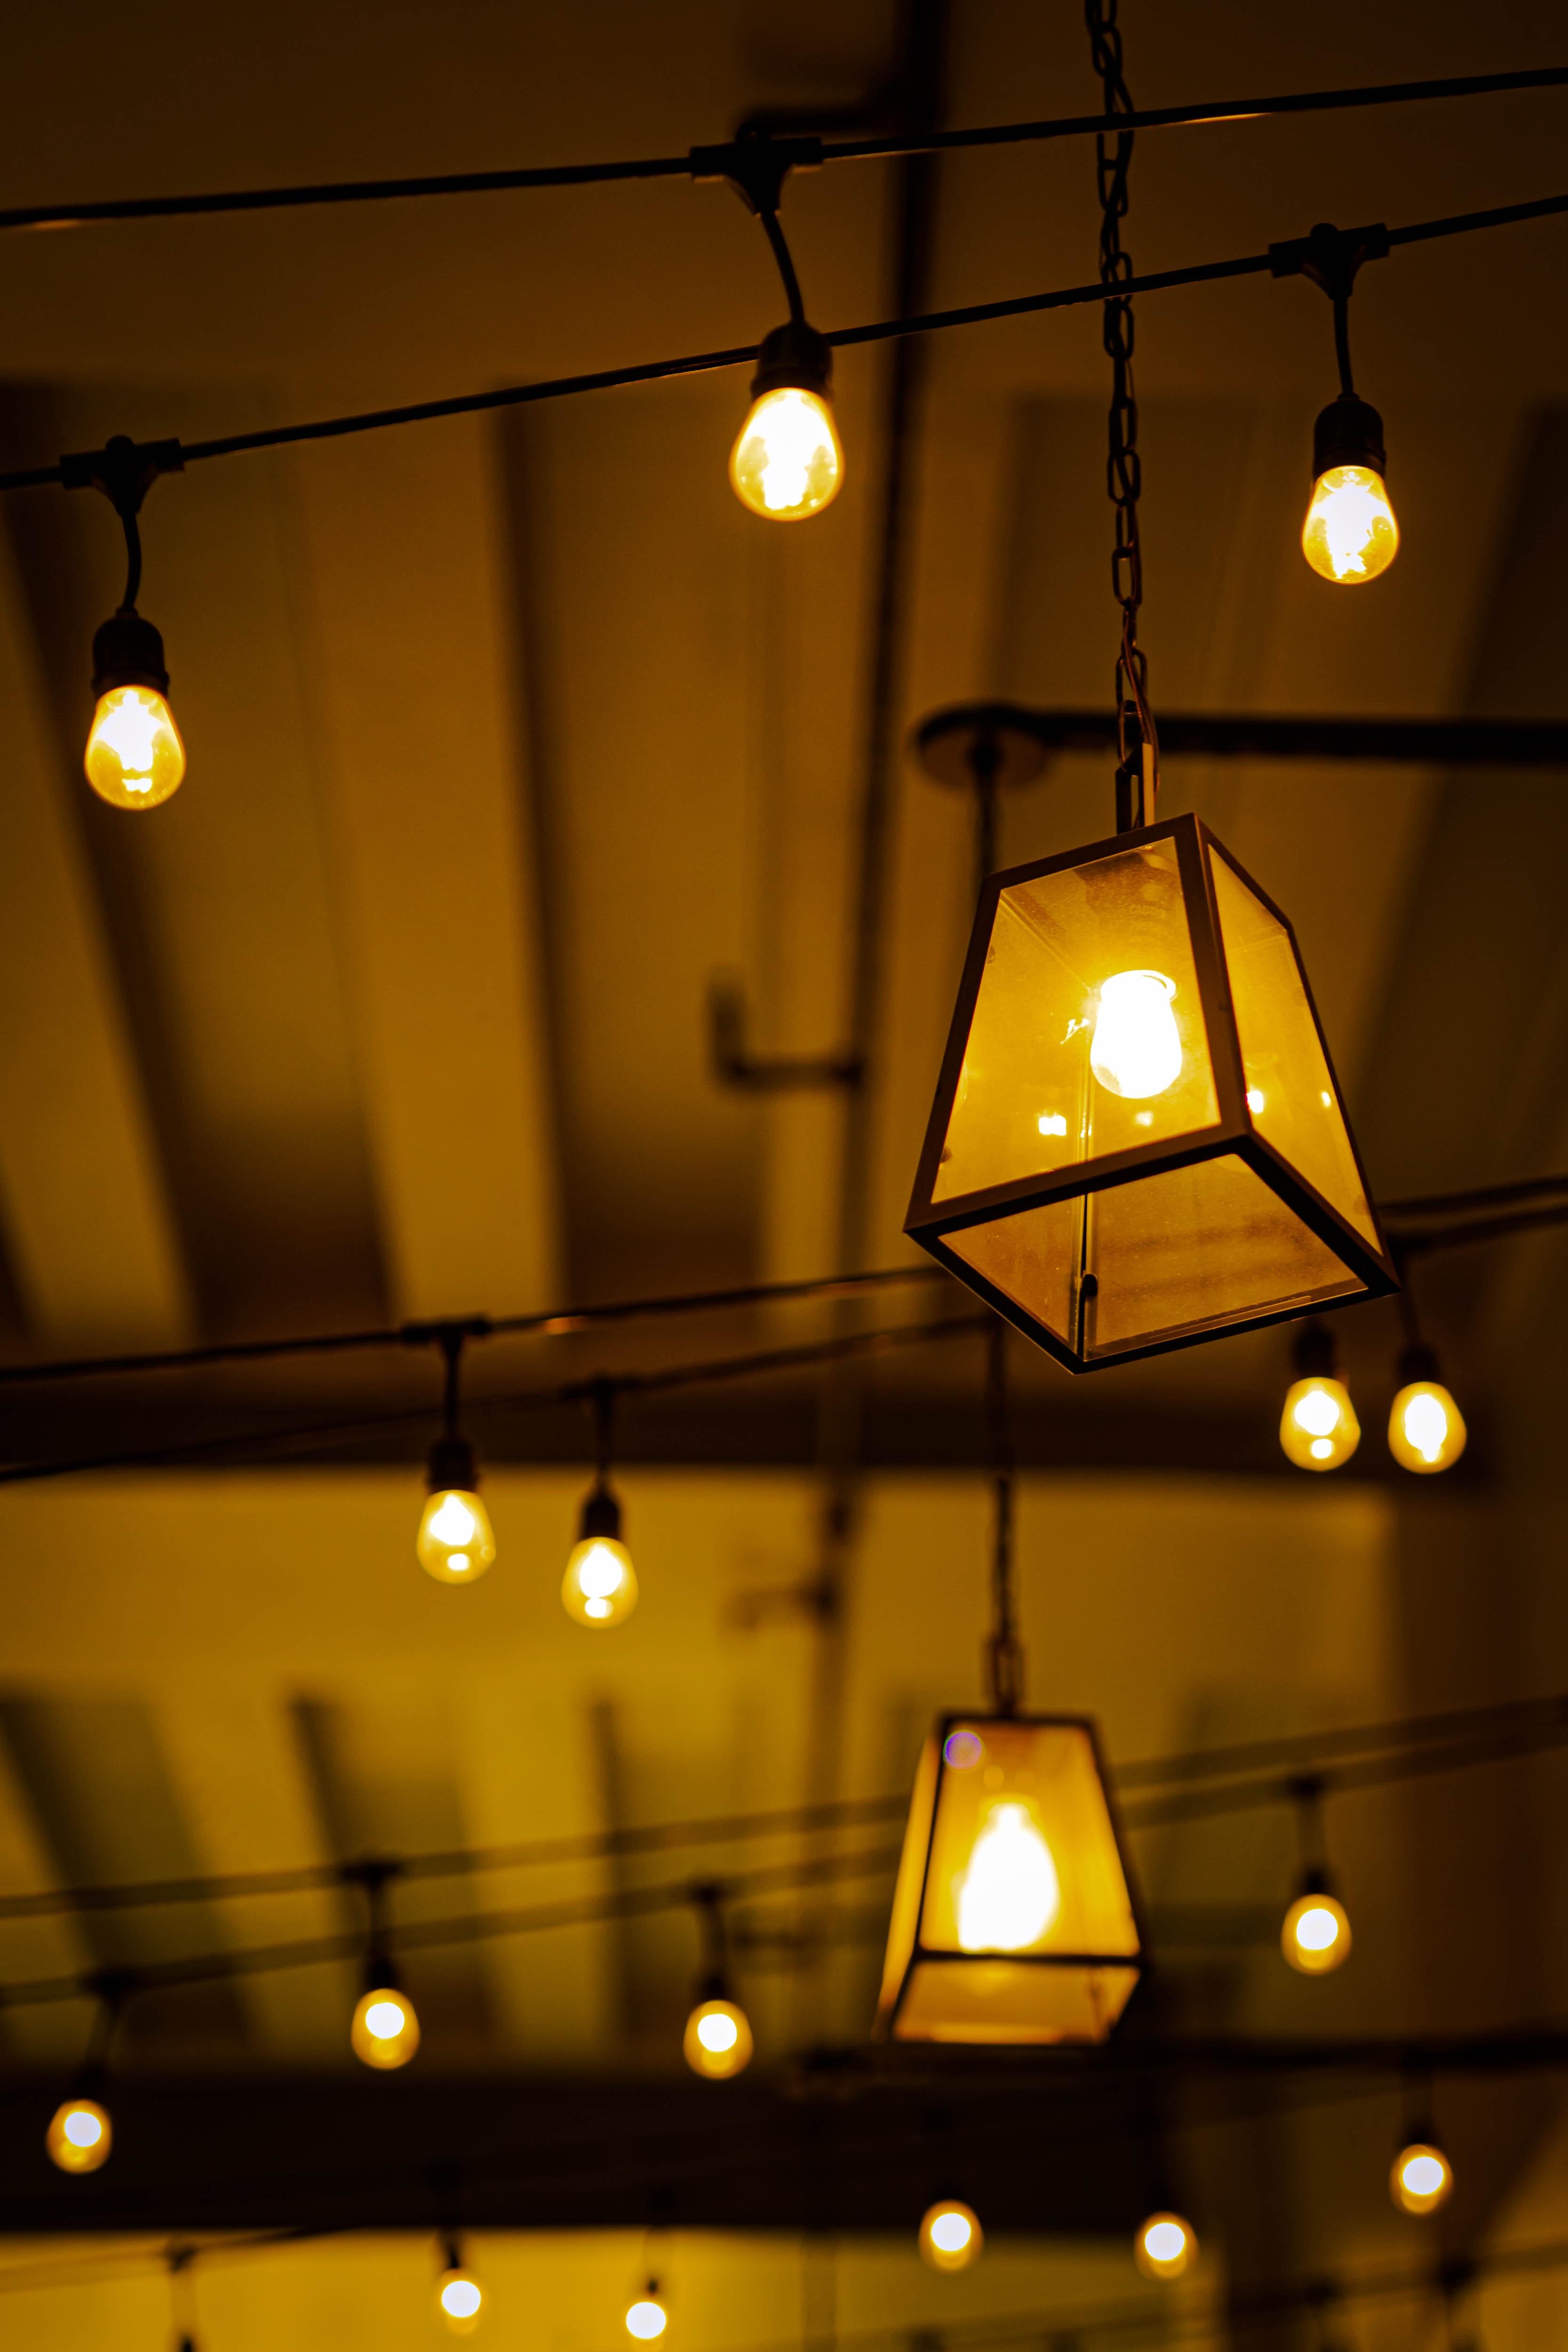 66339 download wallpaper Miscellaneous, Light, Lights, Shine, Miscellanea, Lanterns, Illumination, Garland, Lighting, Garlands, Light Bulbs screensavers and pictures for free